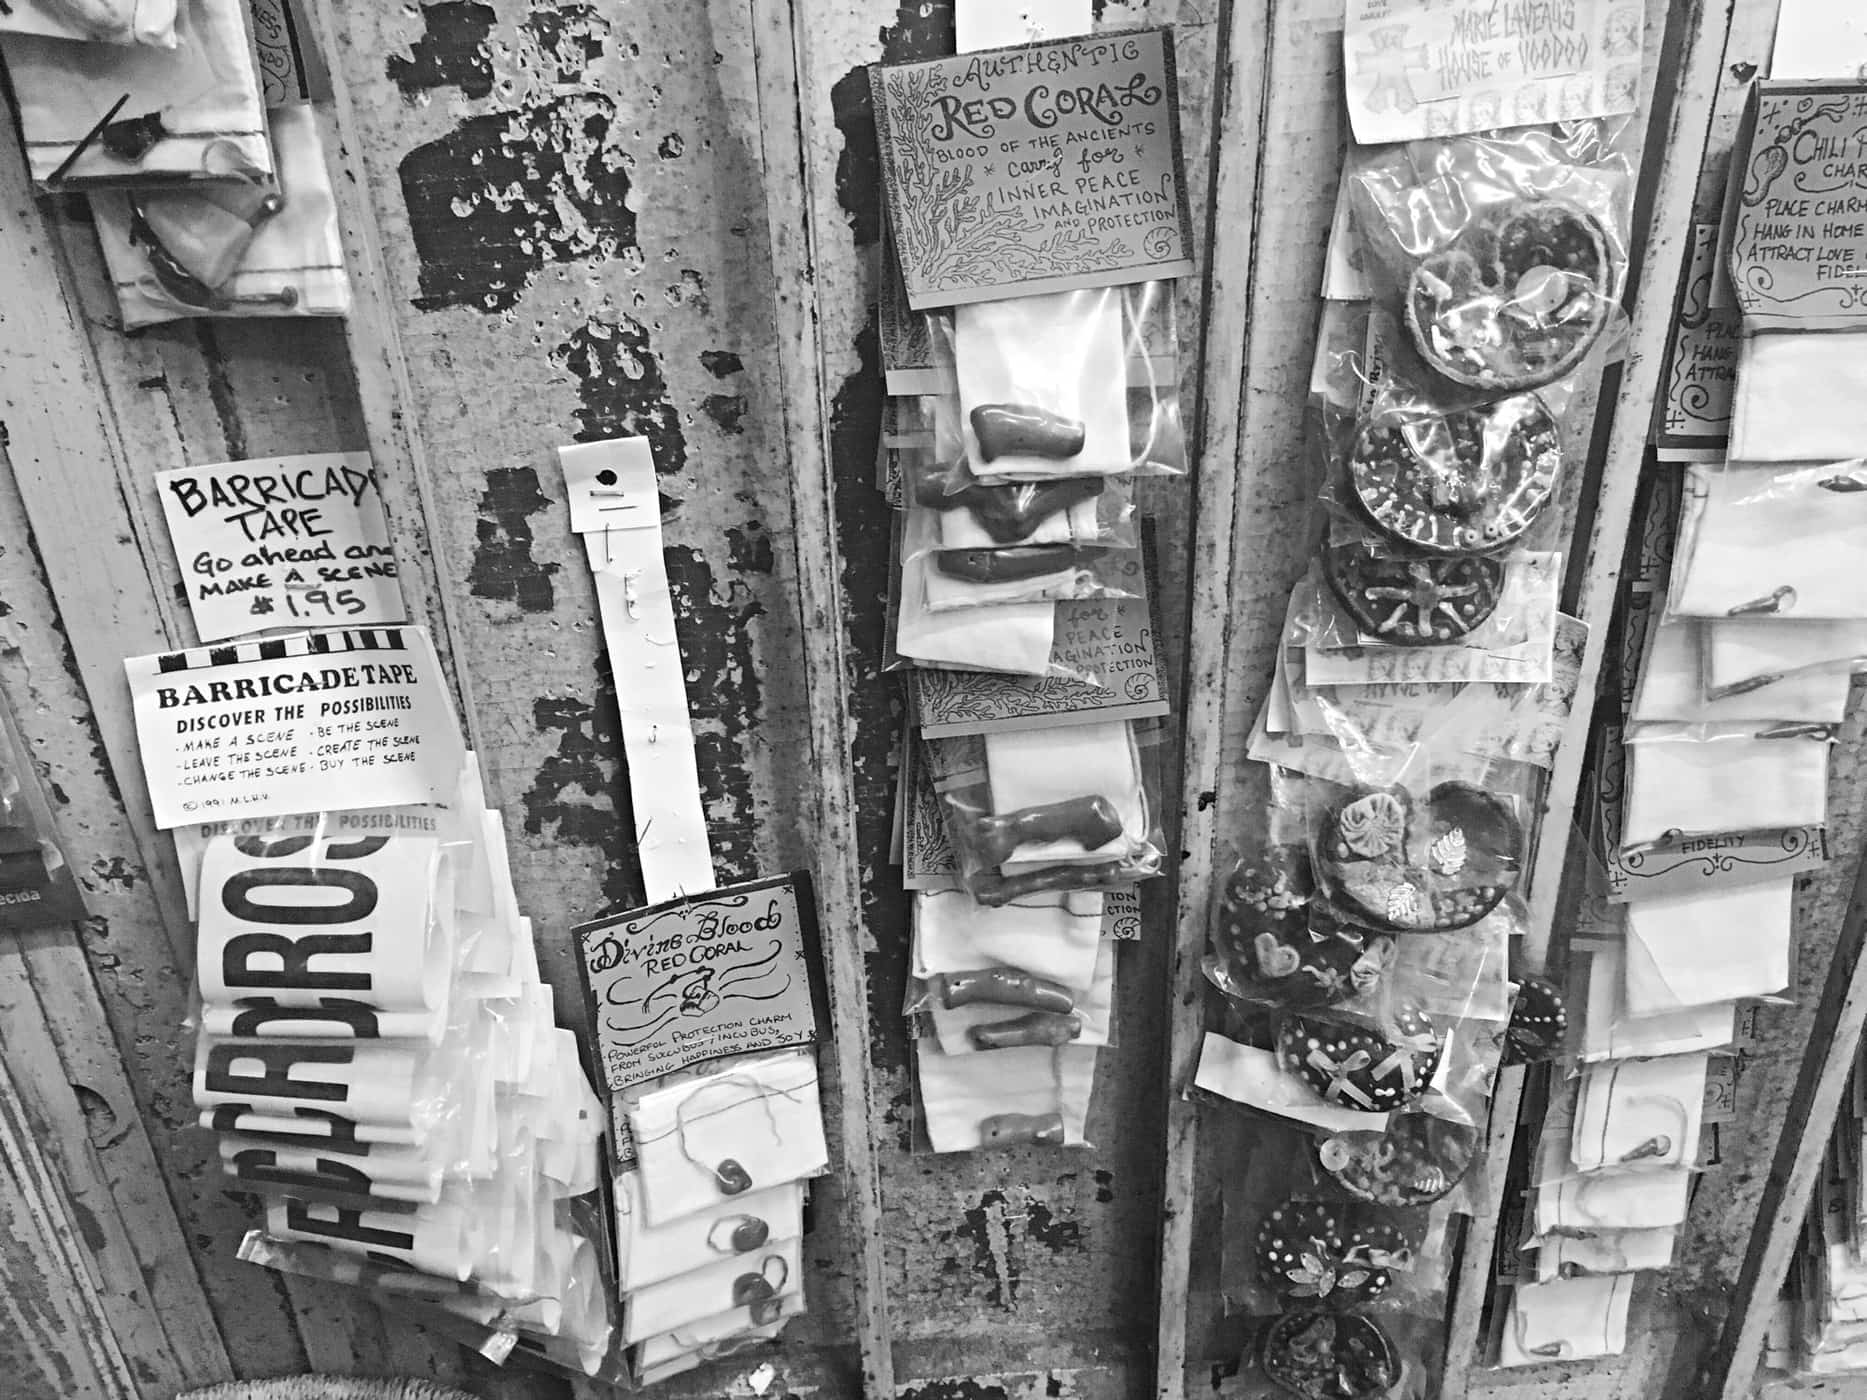 Voodoo shop in New Orleans.